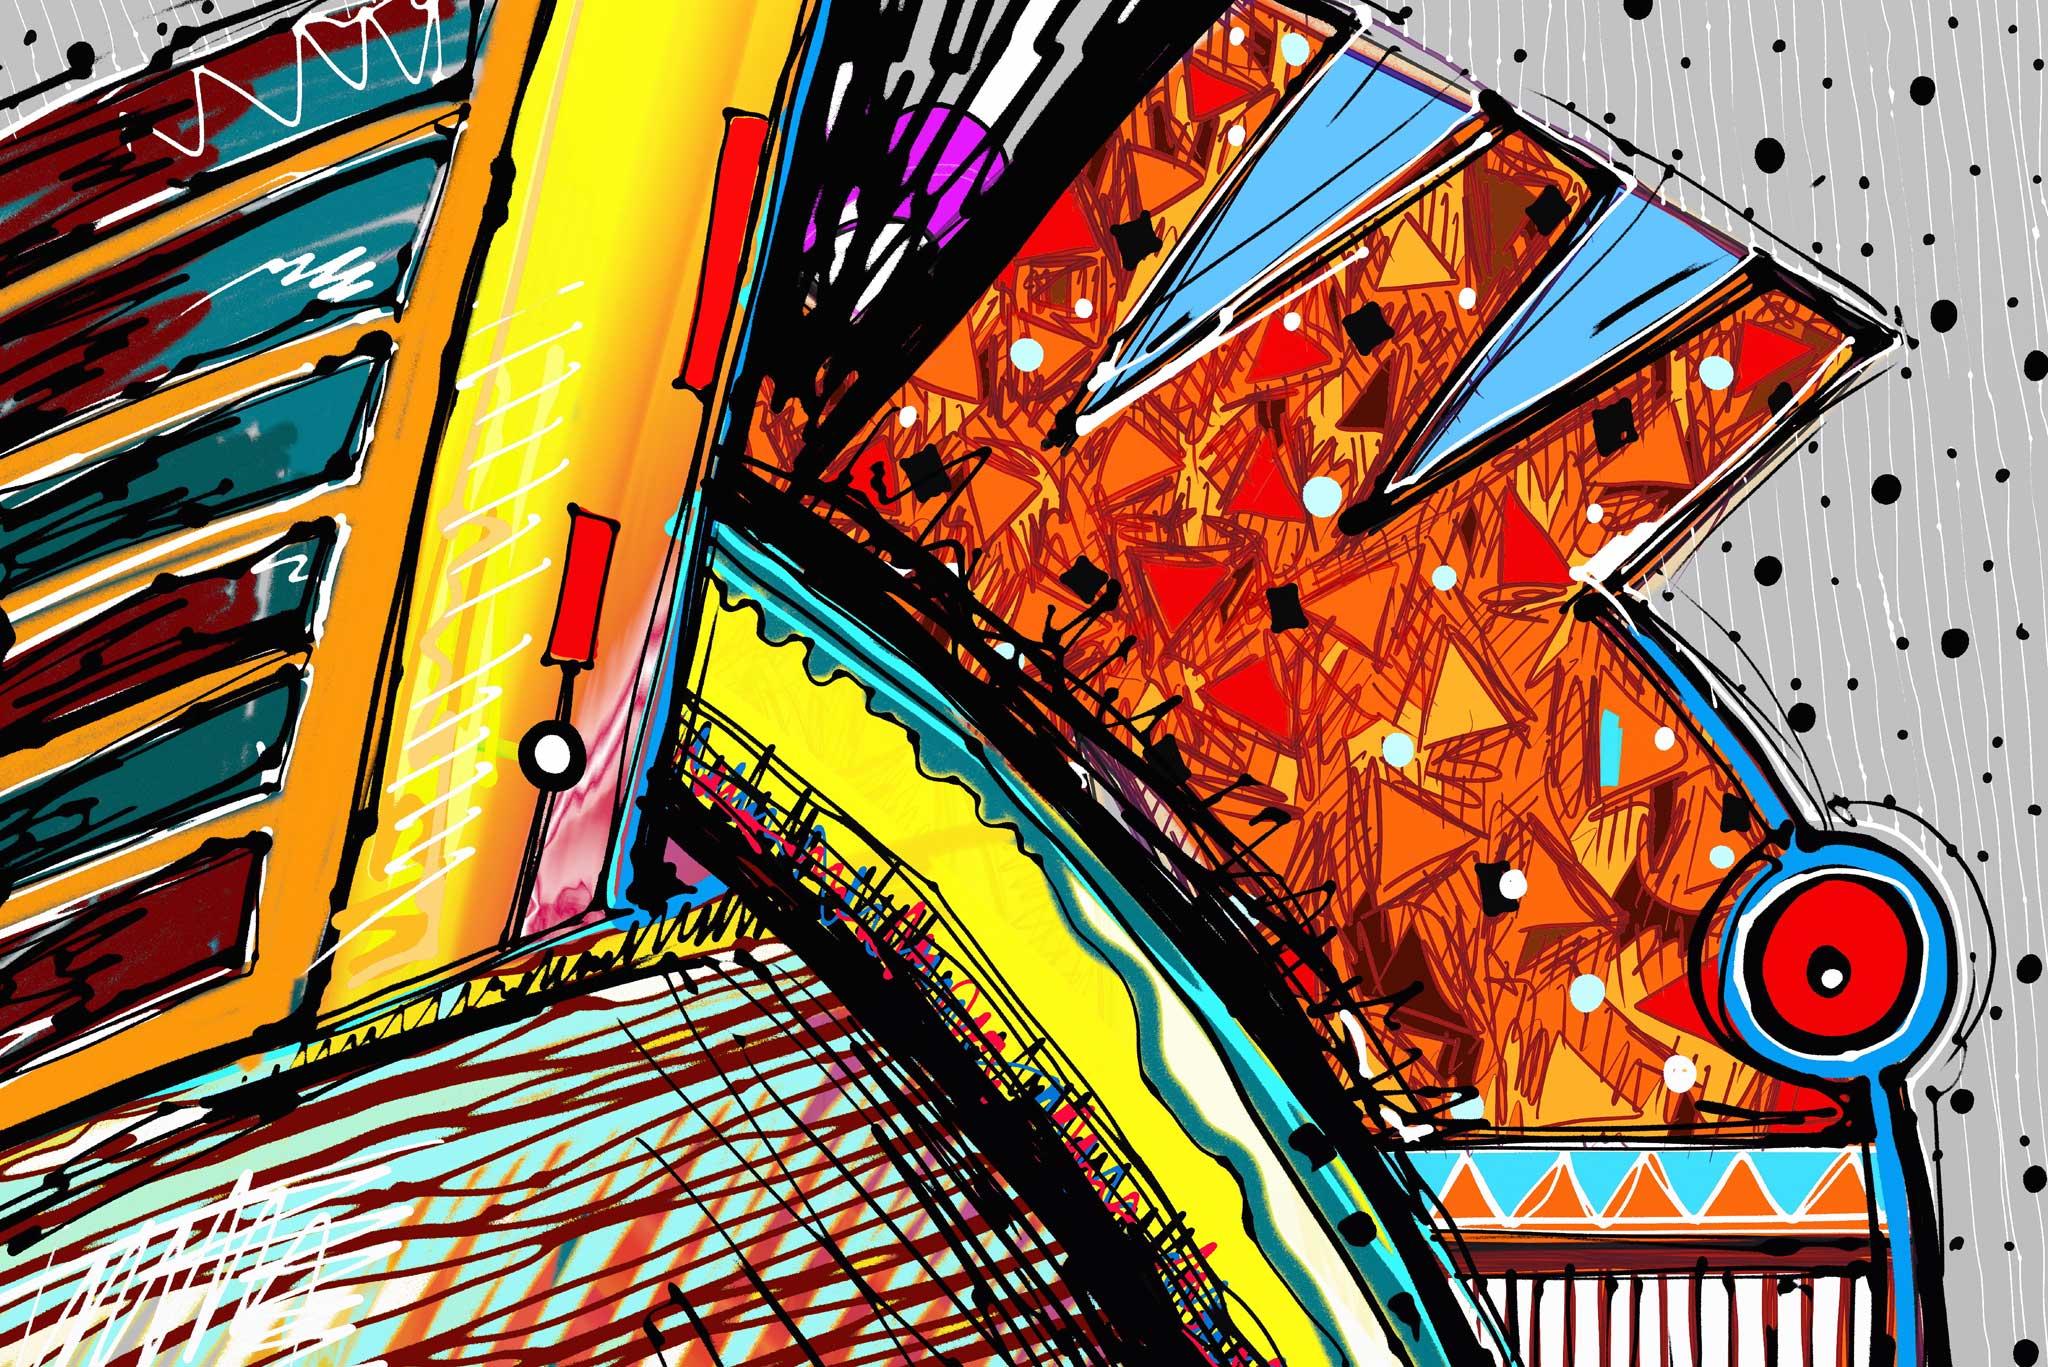 tapet-fototapet-design-decor-mural-customizabil-comanda-personalizat-bucuresti-daring-prints-motiv-model-desen-industrial-grunge-graffitti-multicolor